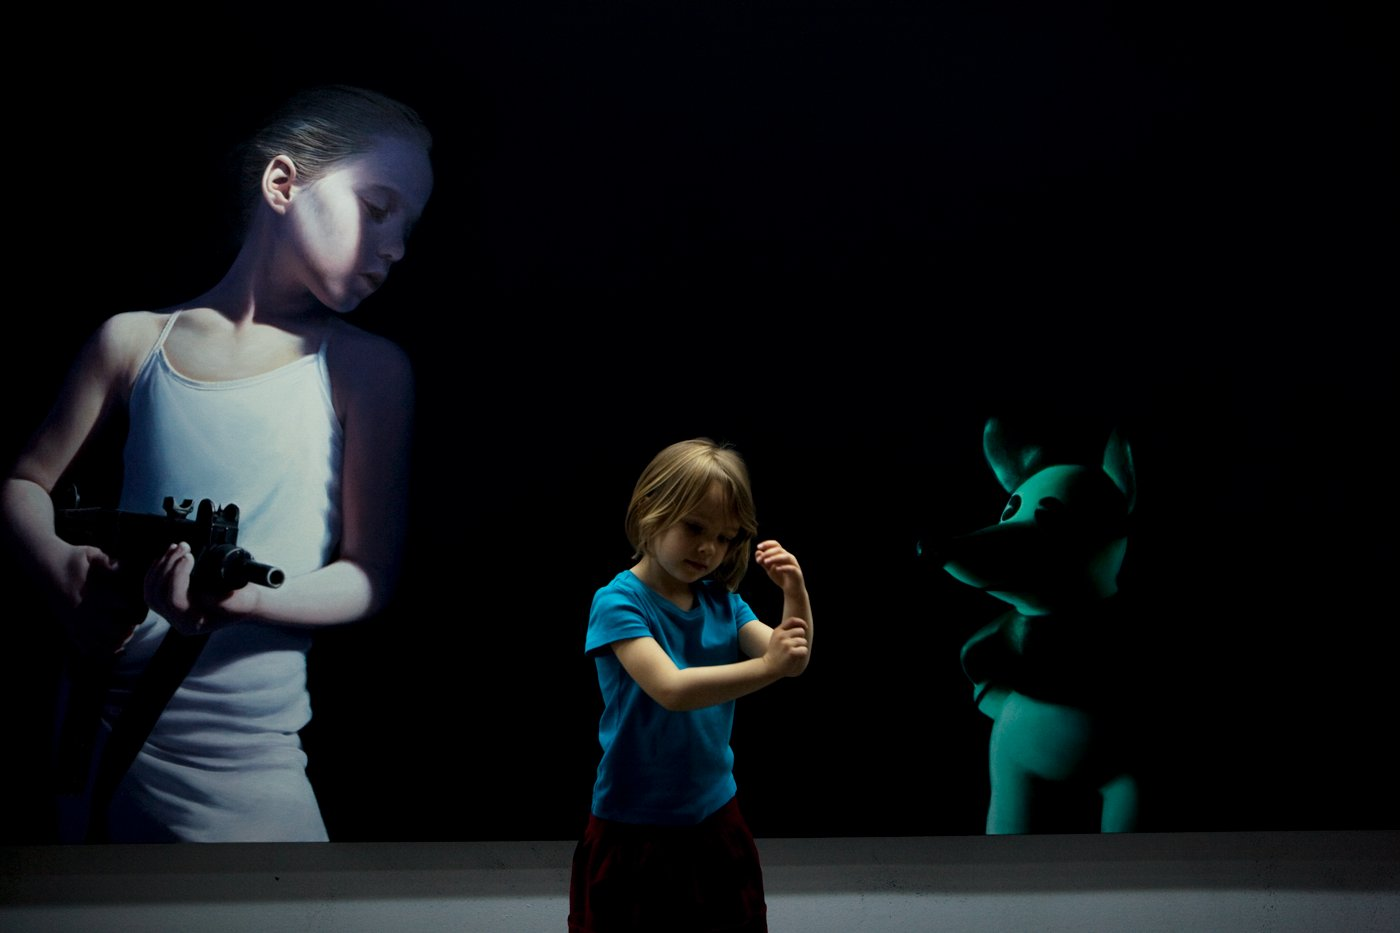 Croí (cree) Sequoia Helnwein in the studio